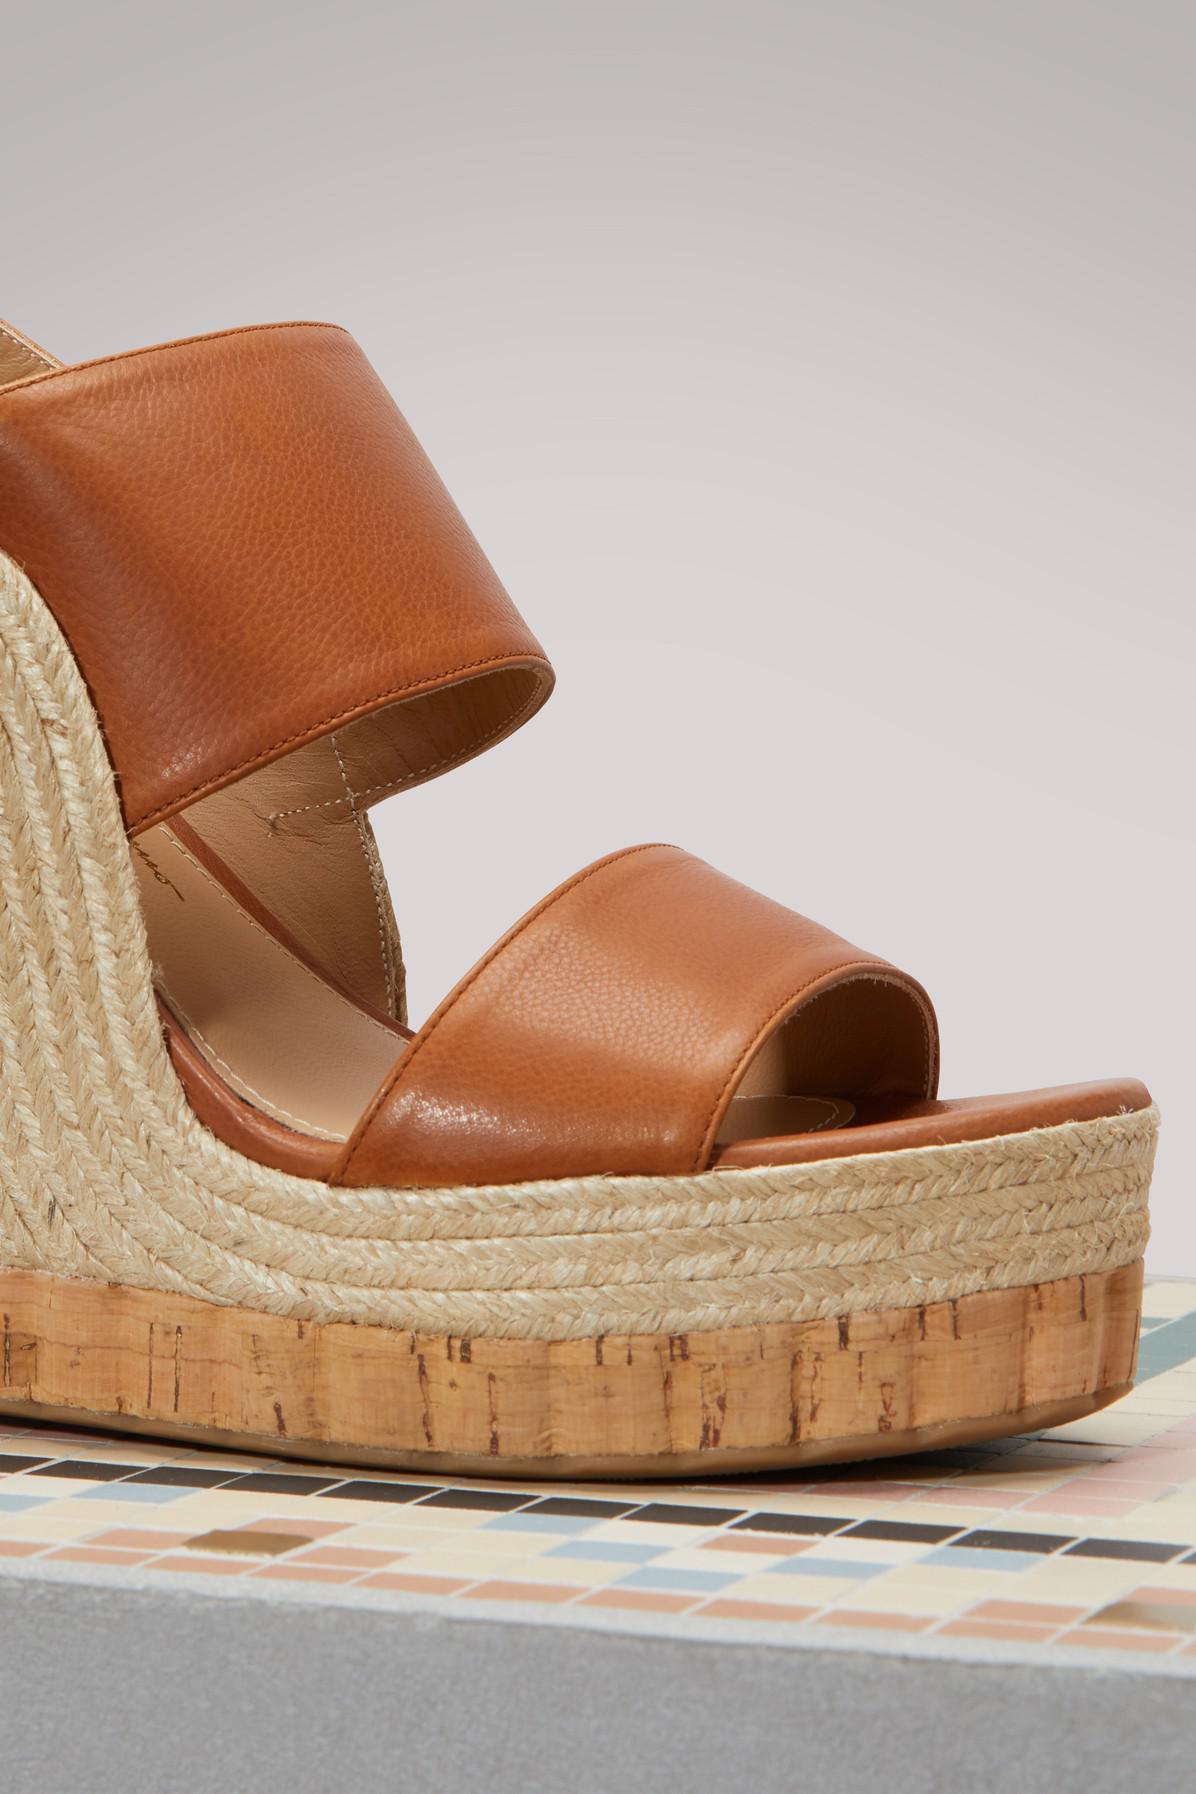 8cb37a1f850 Lyst - Ferragamo Maratea Wedge Sandals in Brown